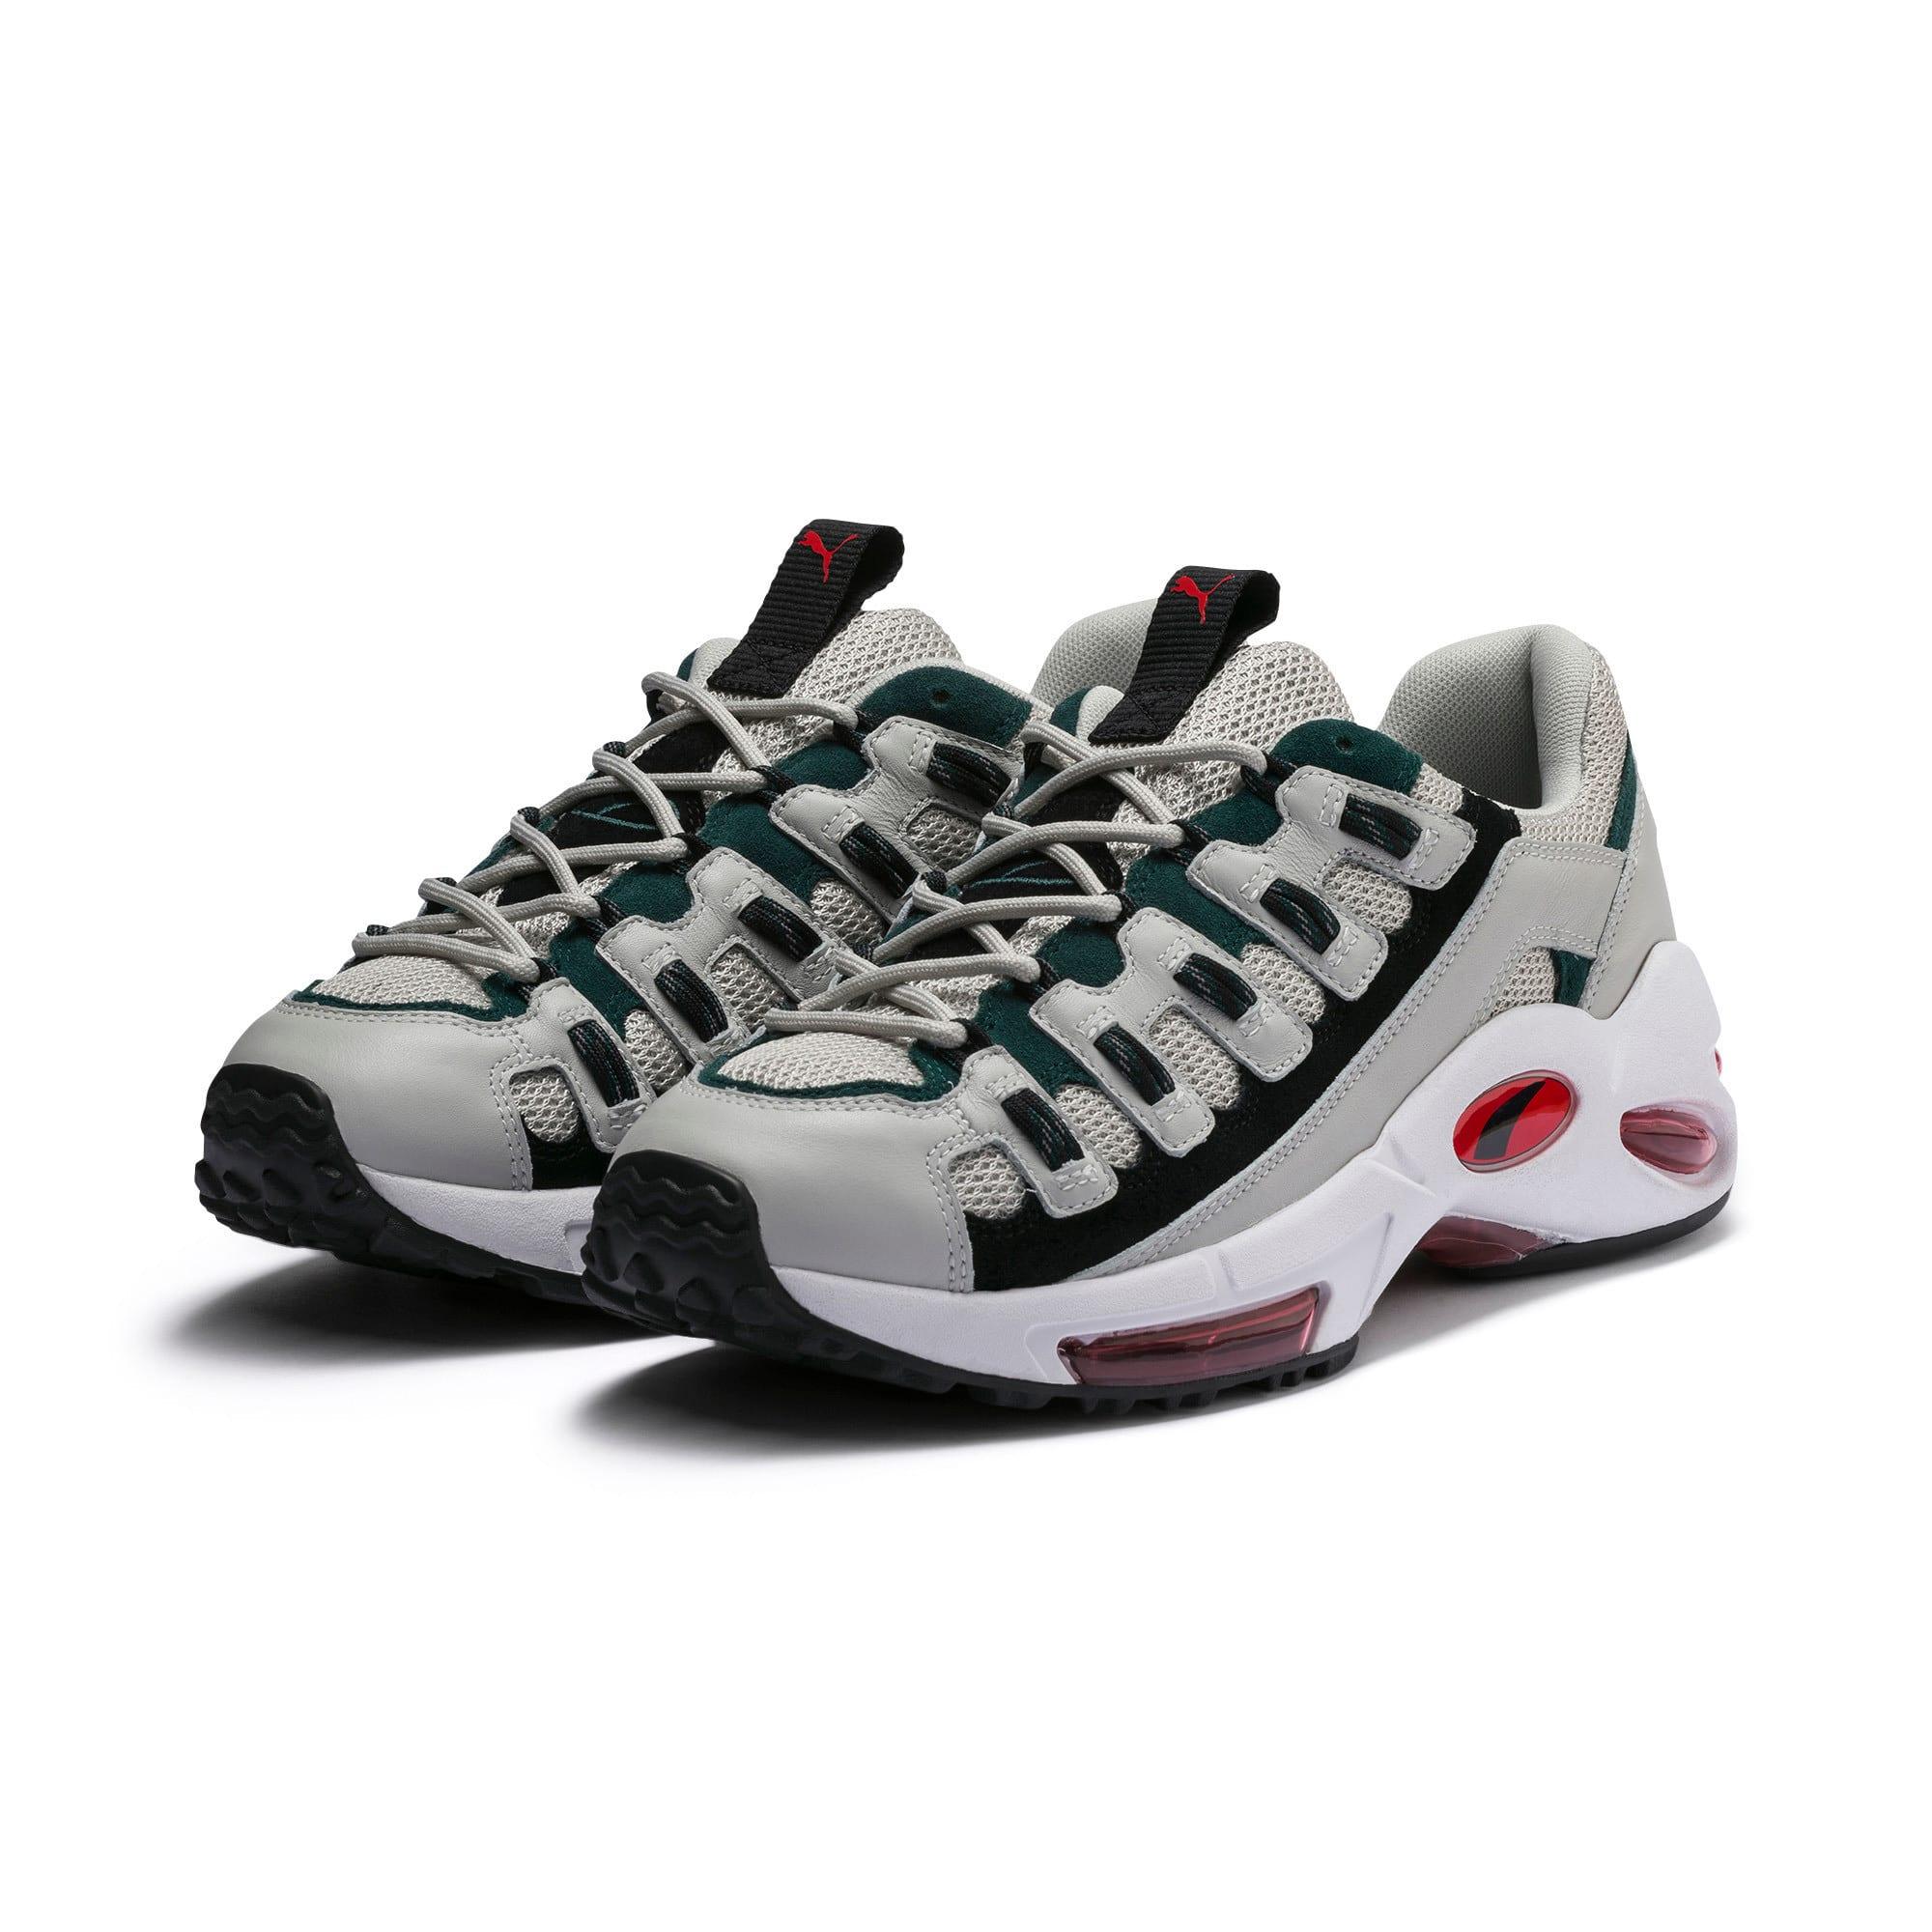 Thumbnail 2 of CELL Endura Sneakers, Glacier Gray-High Risk Red, medium